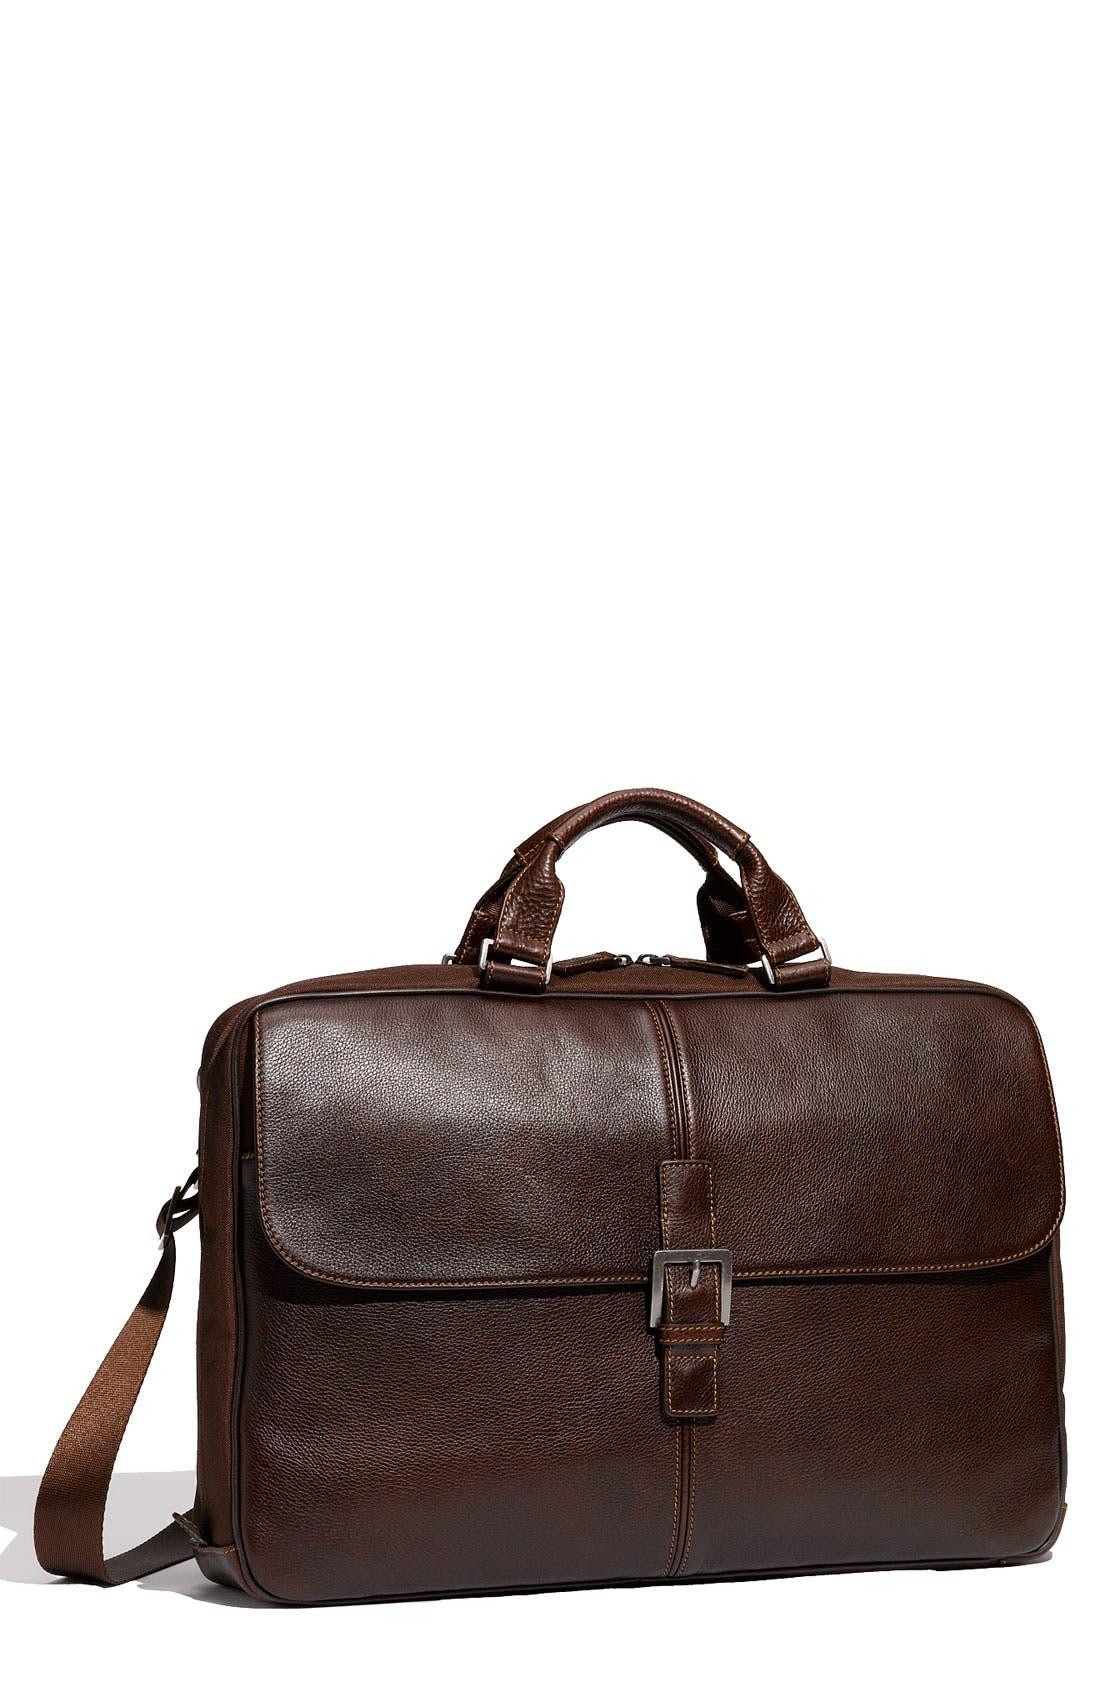 Main Image - Boconi 'Tyler - Dispatche' Tumbled Leather Briefcase